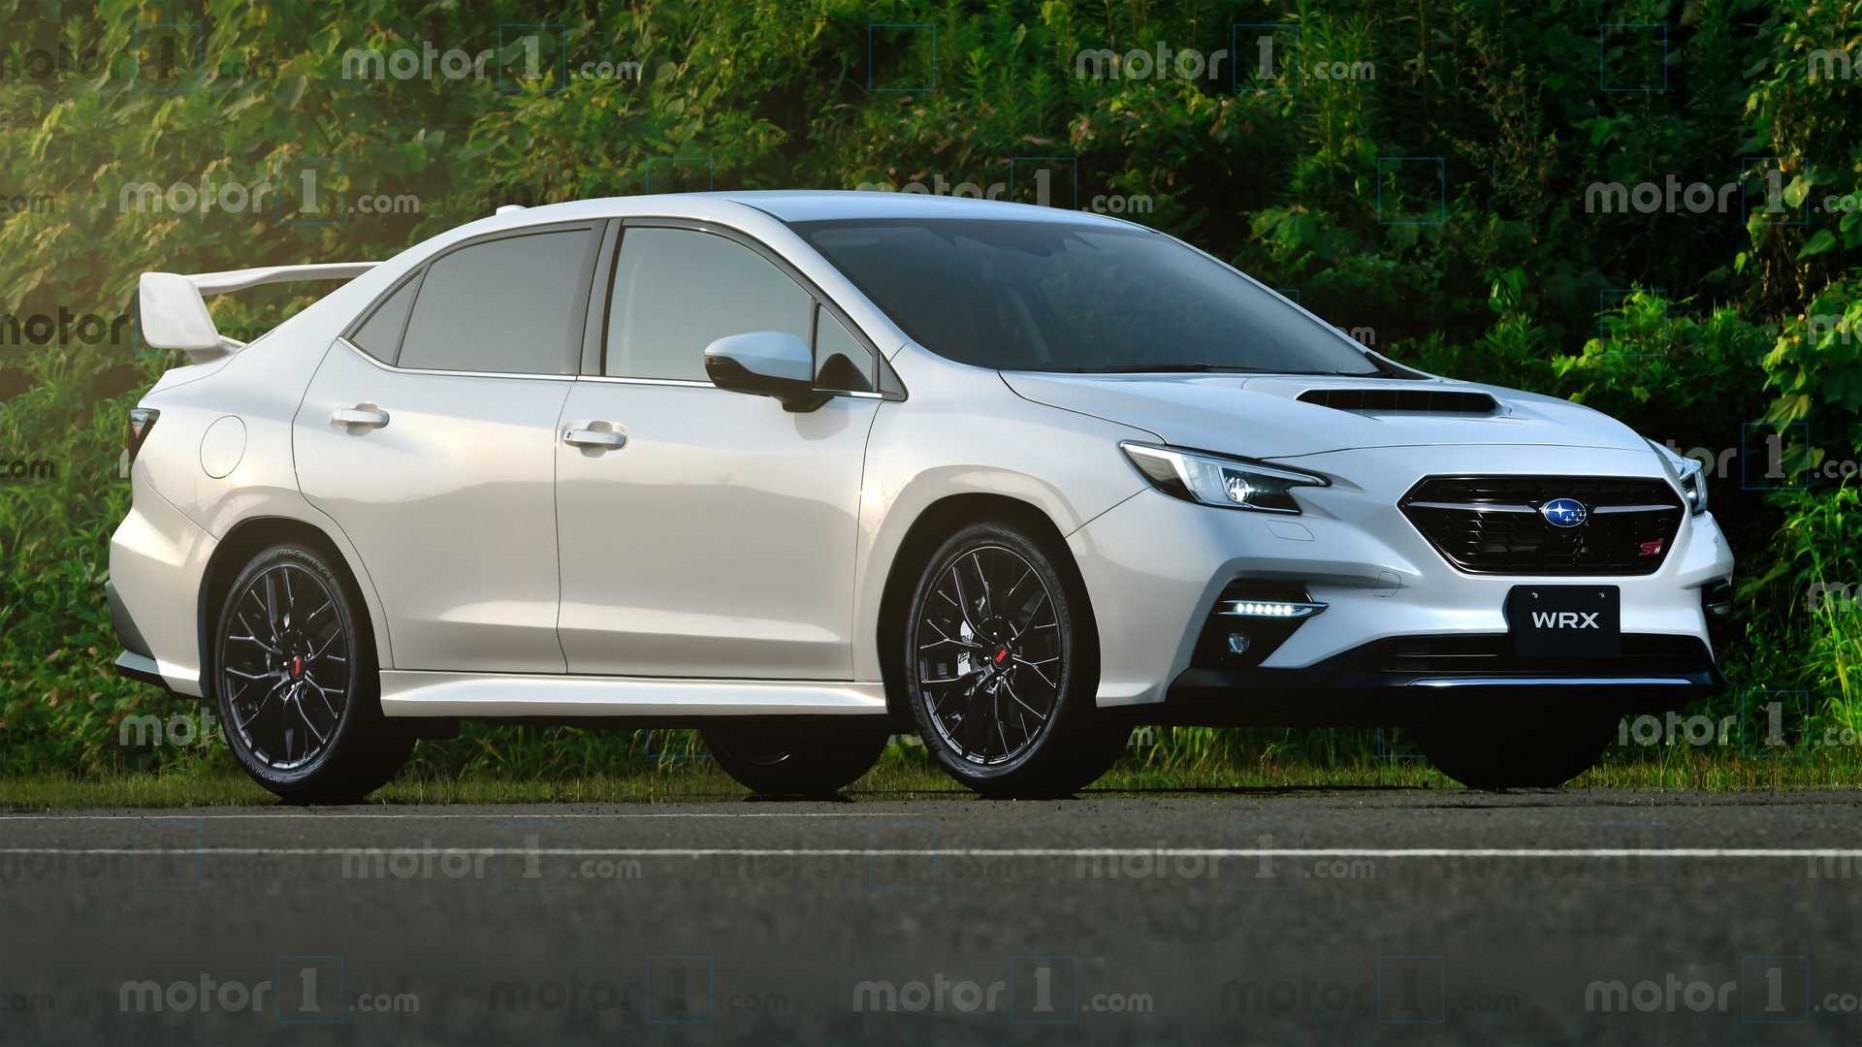 Rumors Subaru Sti 2022 Horsepower